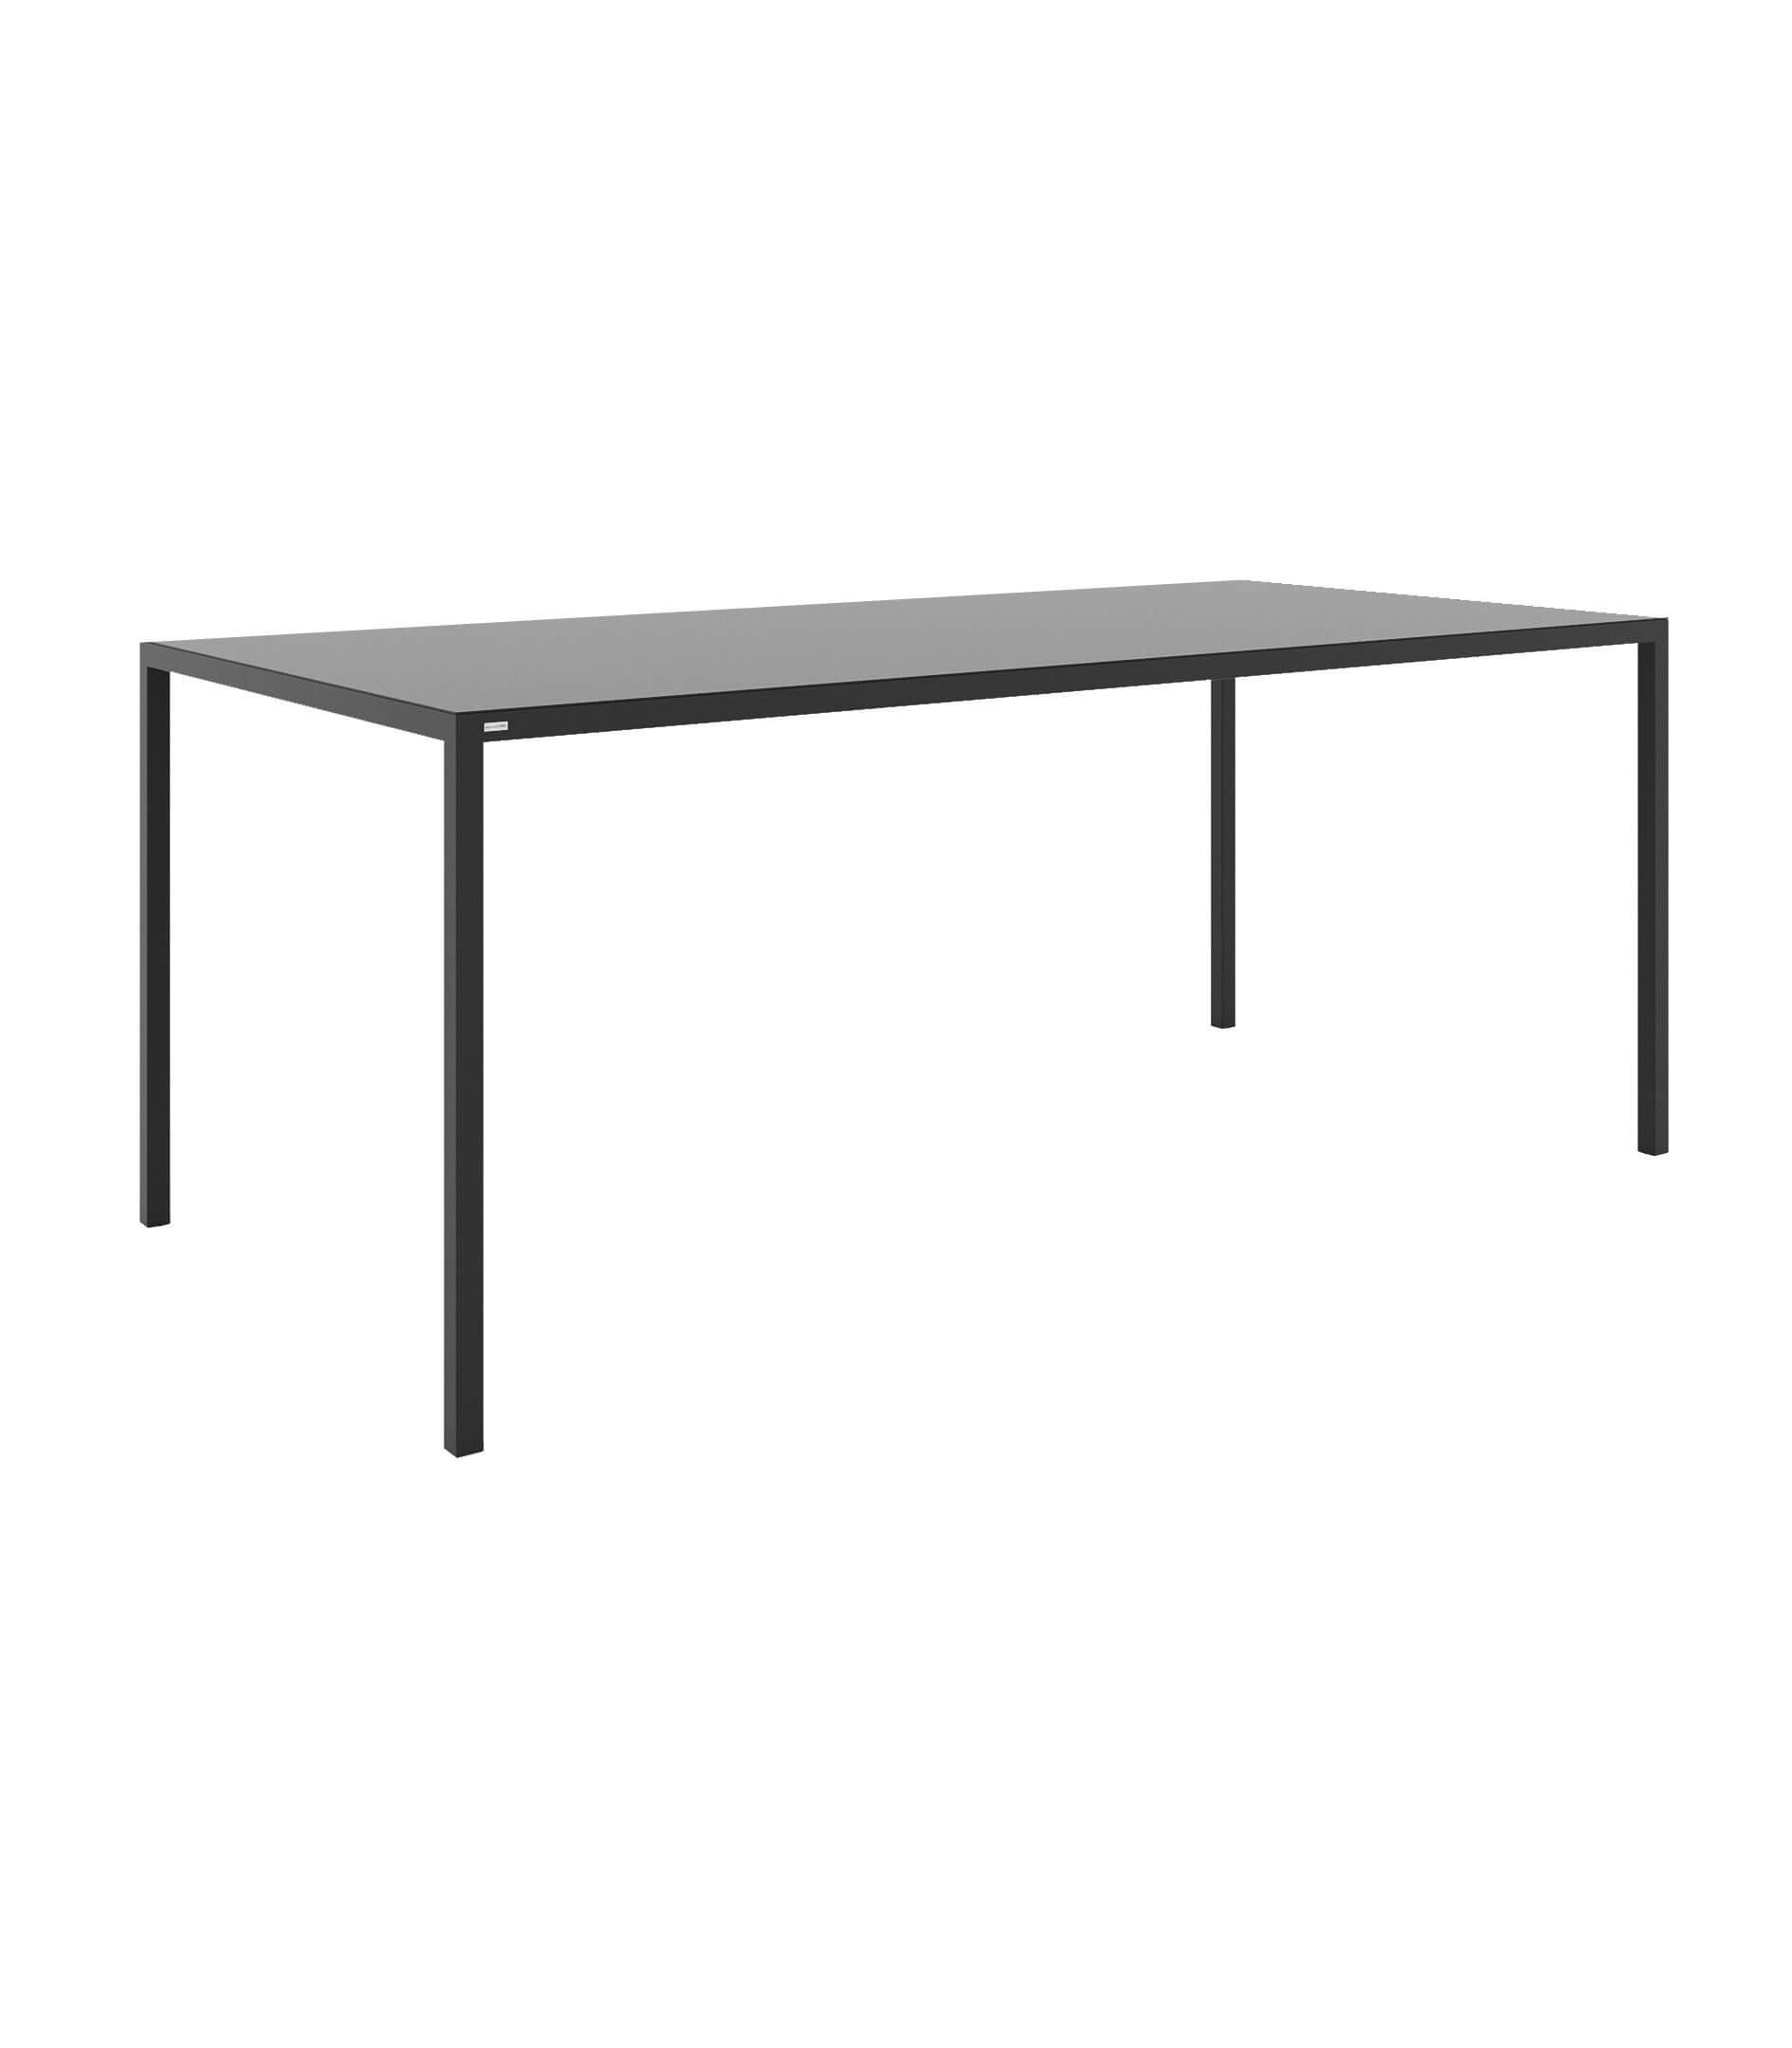 Simplico nowoczesny stół - take me HOME.